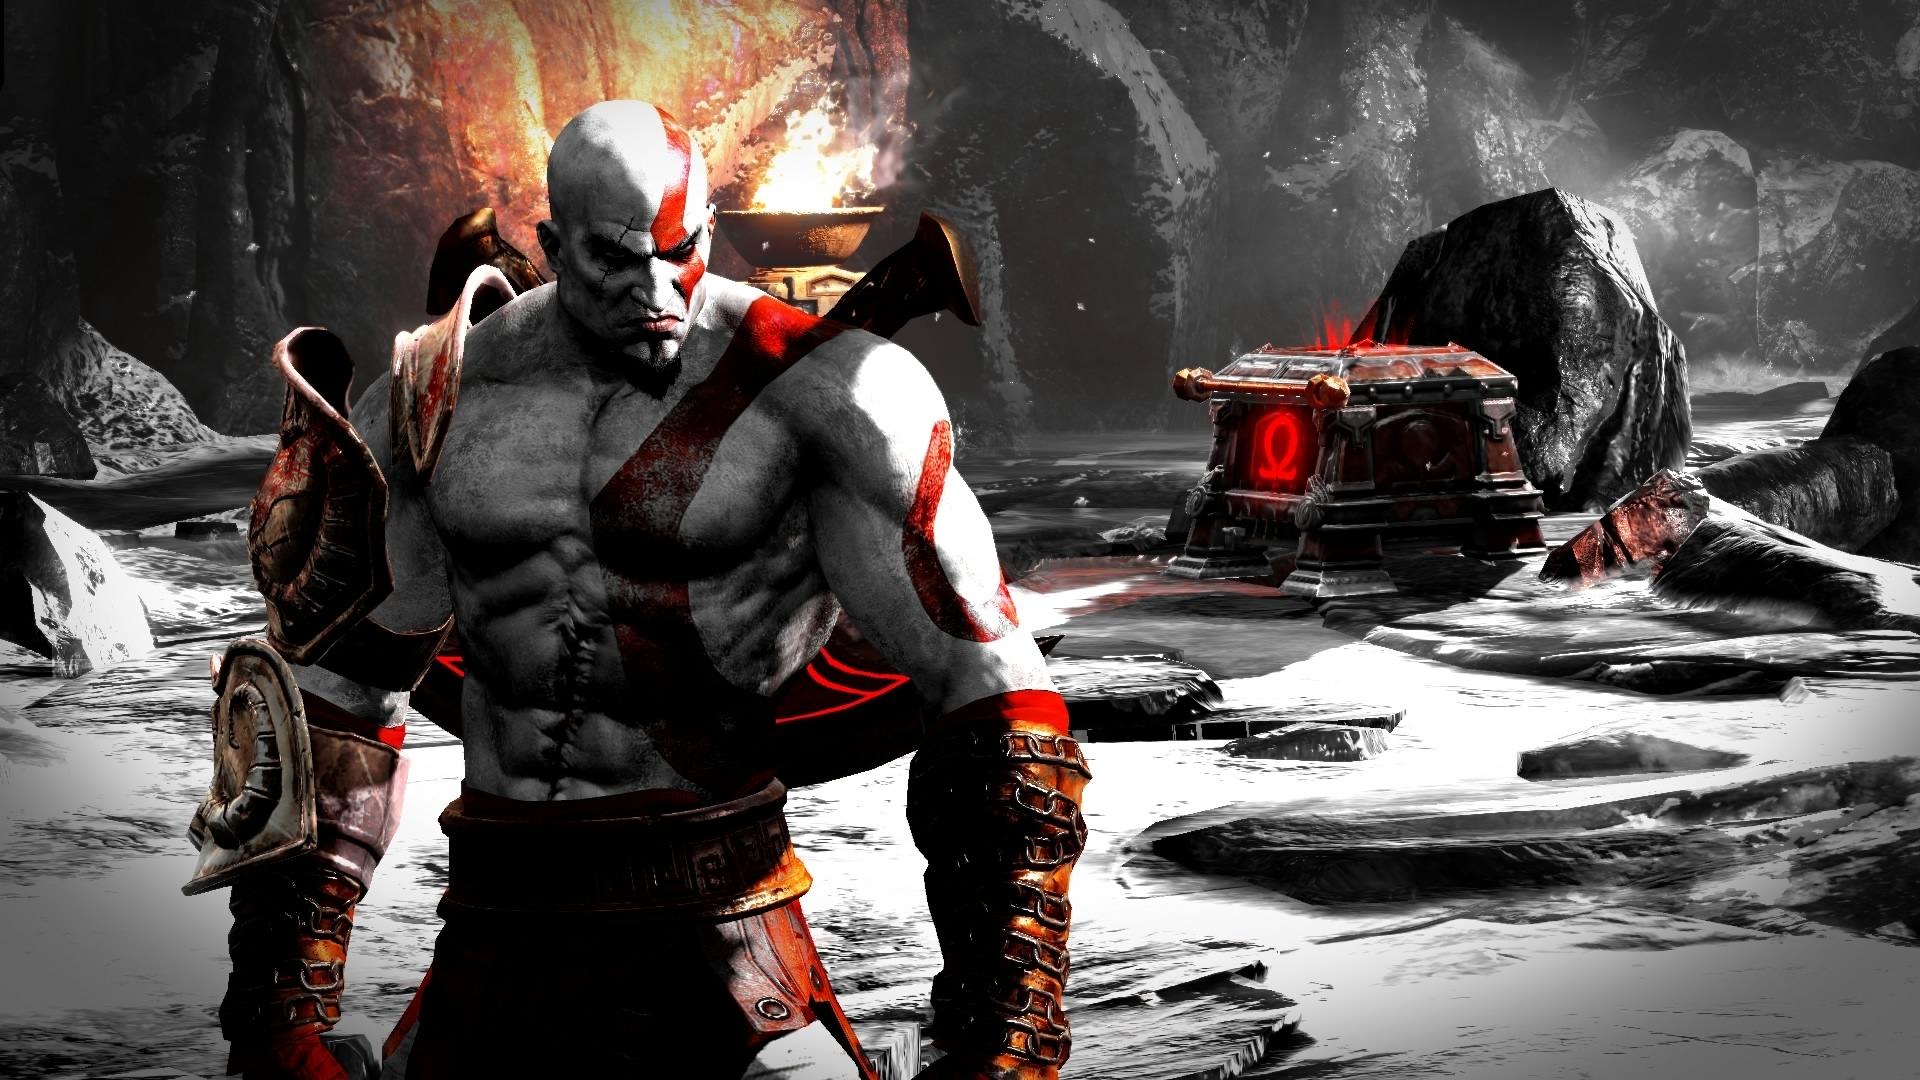 throwback thursday: god of war - dvs gaming